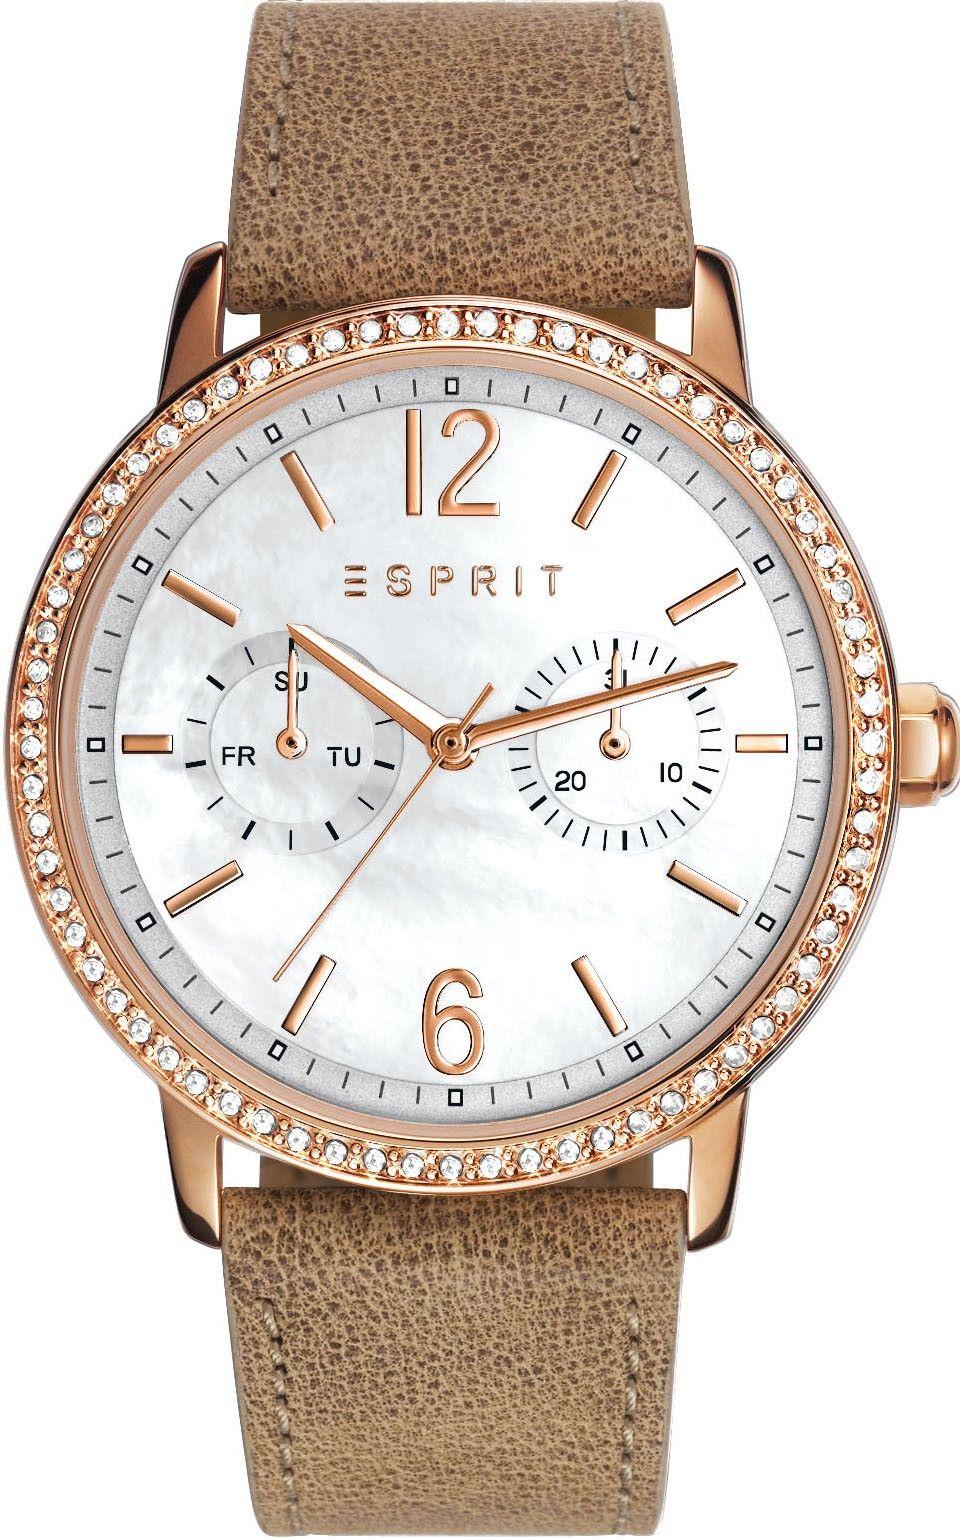 Esprit Es108092006 Bayan Kol Saati Saat Saat Bayan Saatleri Koltuklar